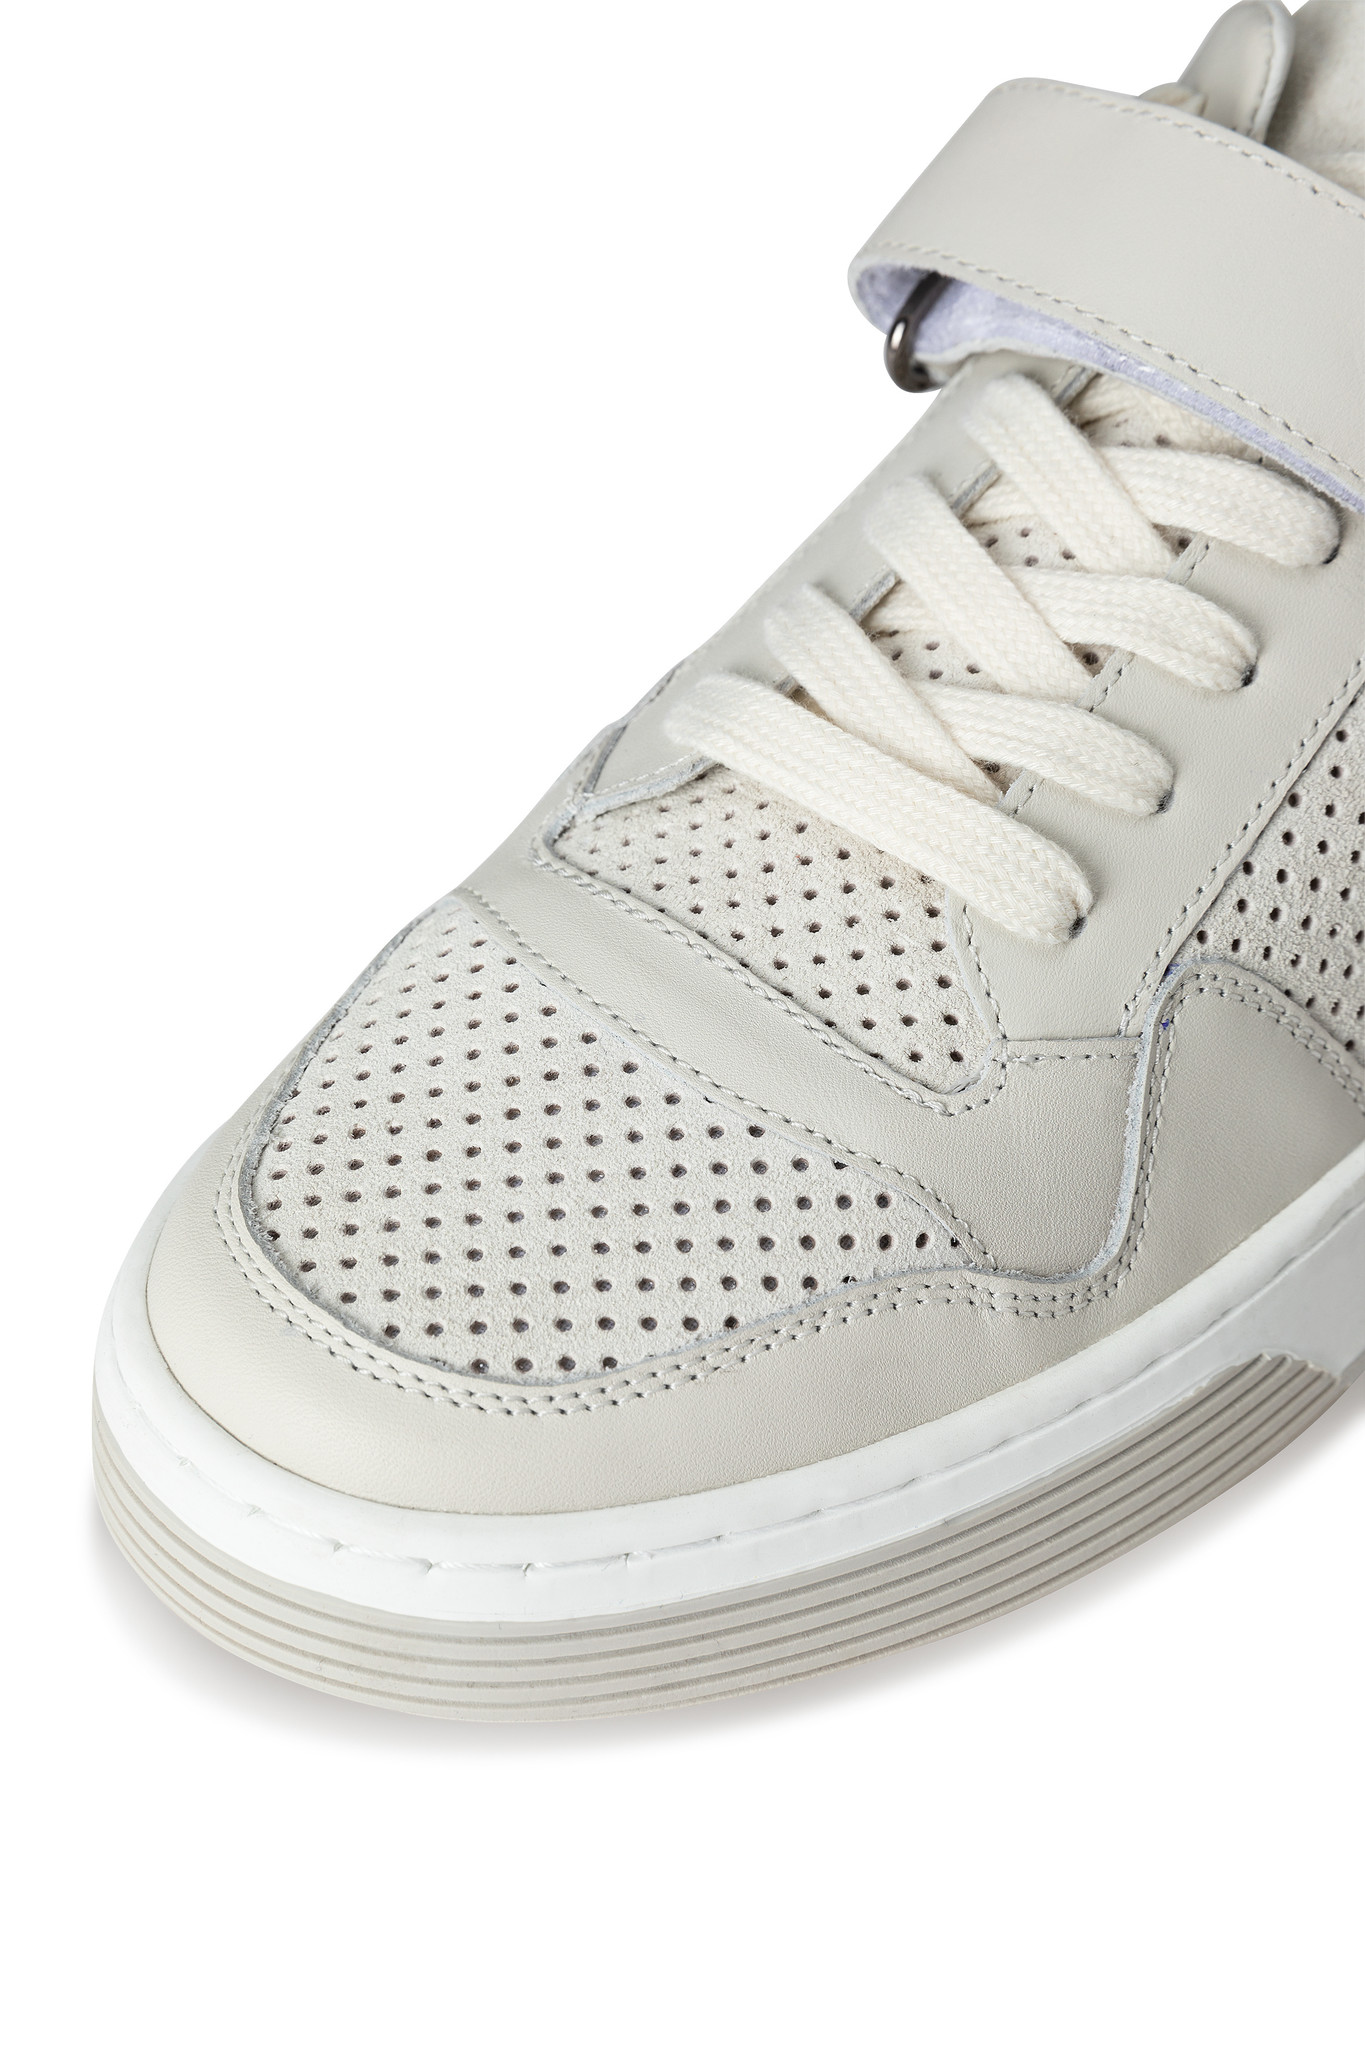 yaya Retro sneaker 134379-111-4